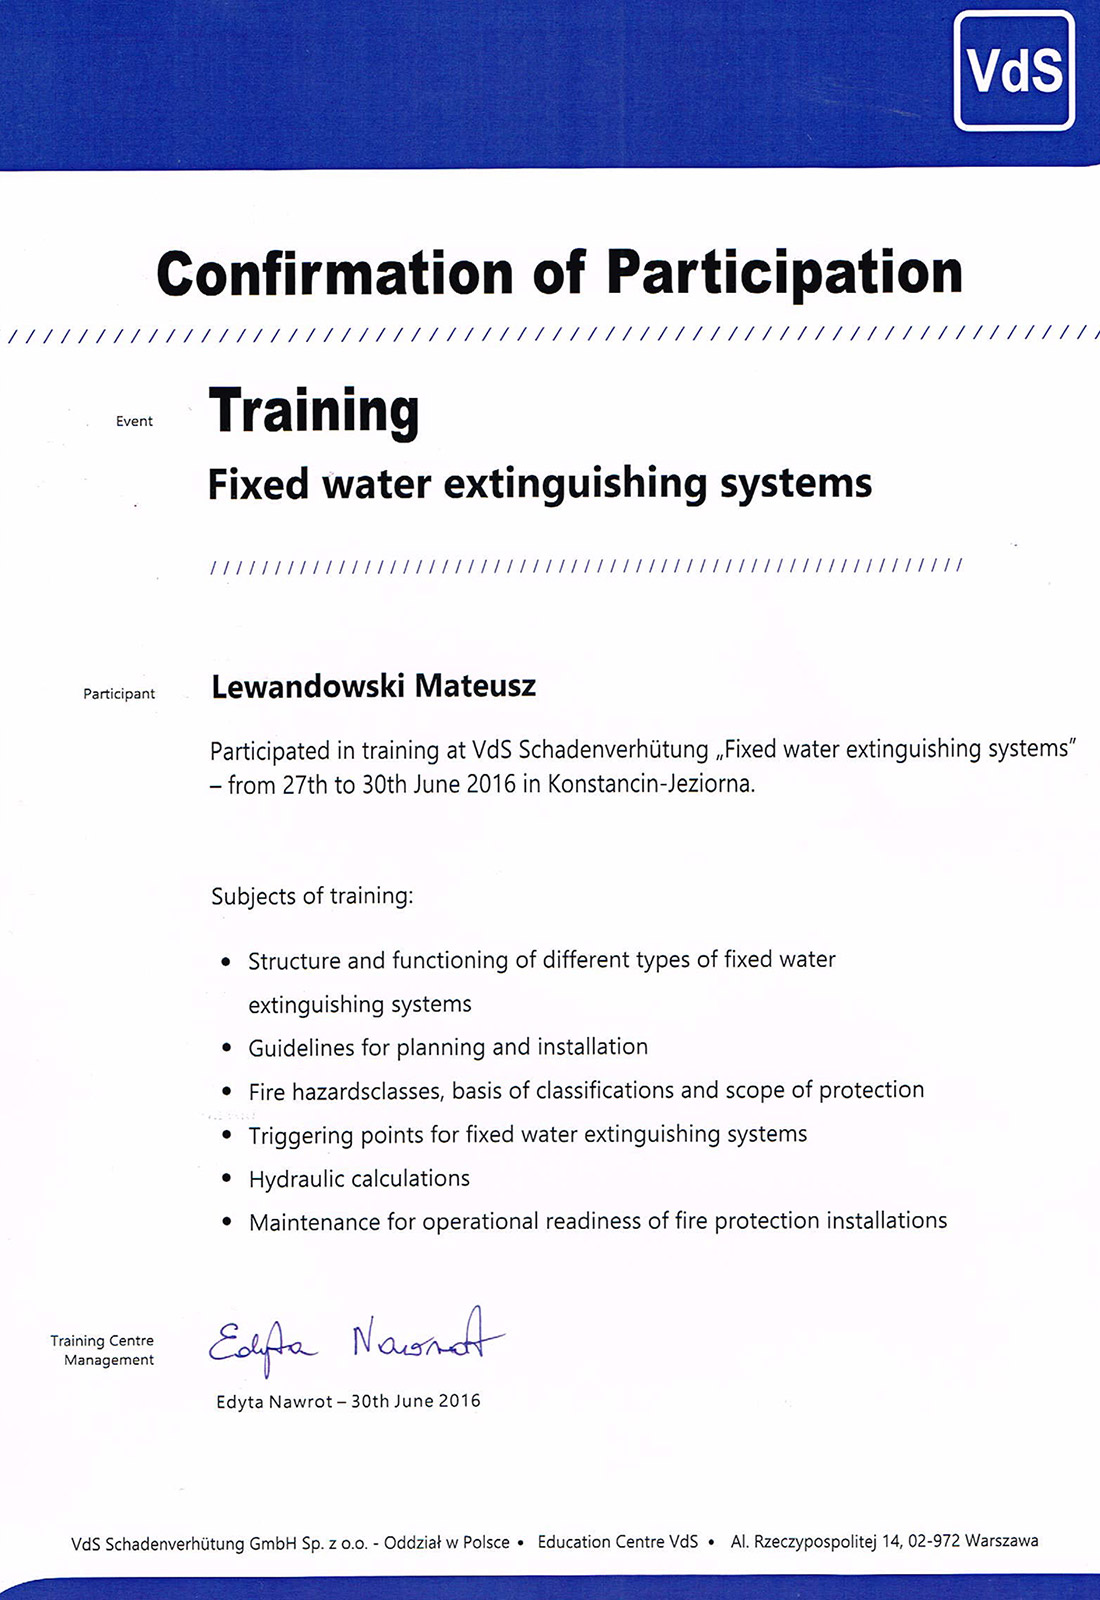 confirmation_fixed_water_ledandowski_mateusz